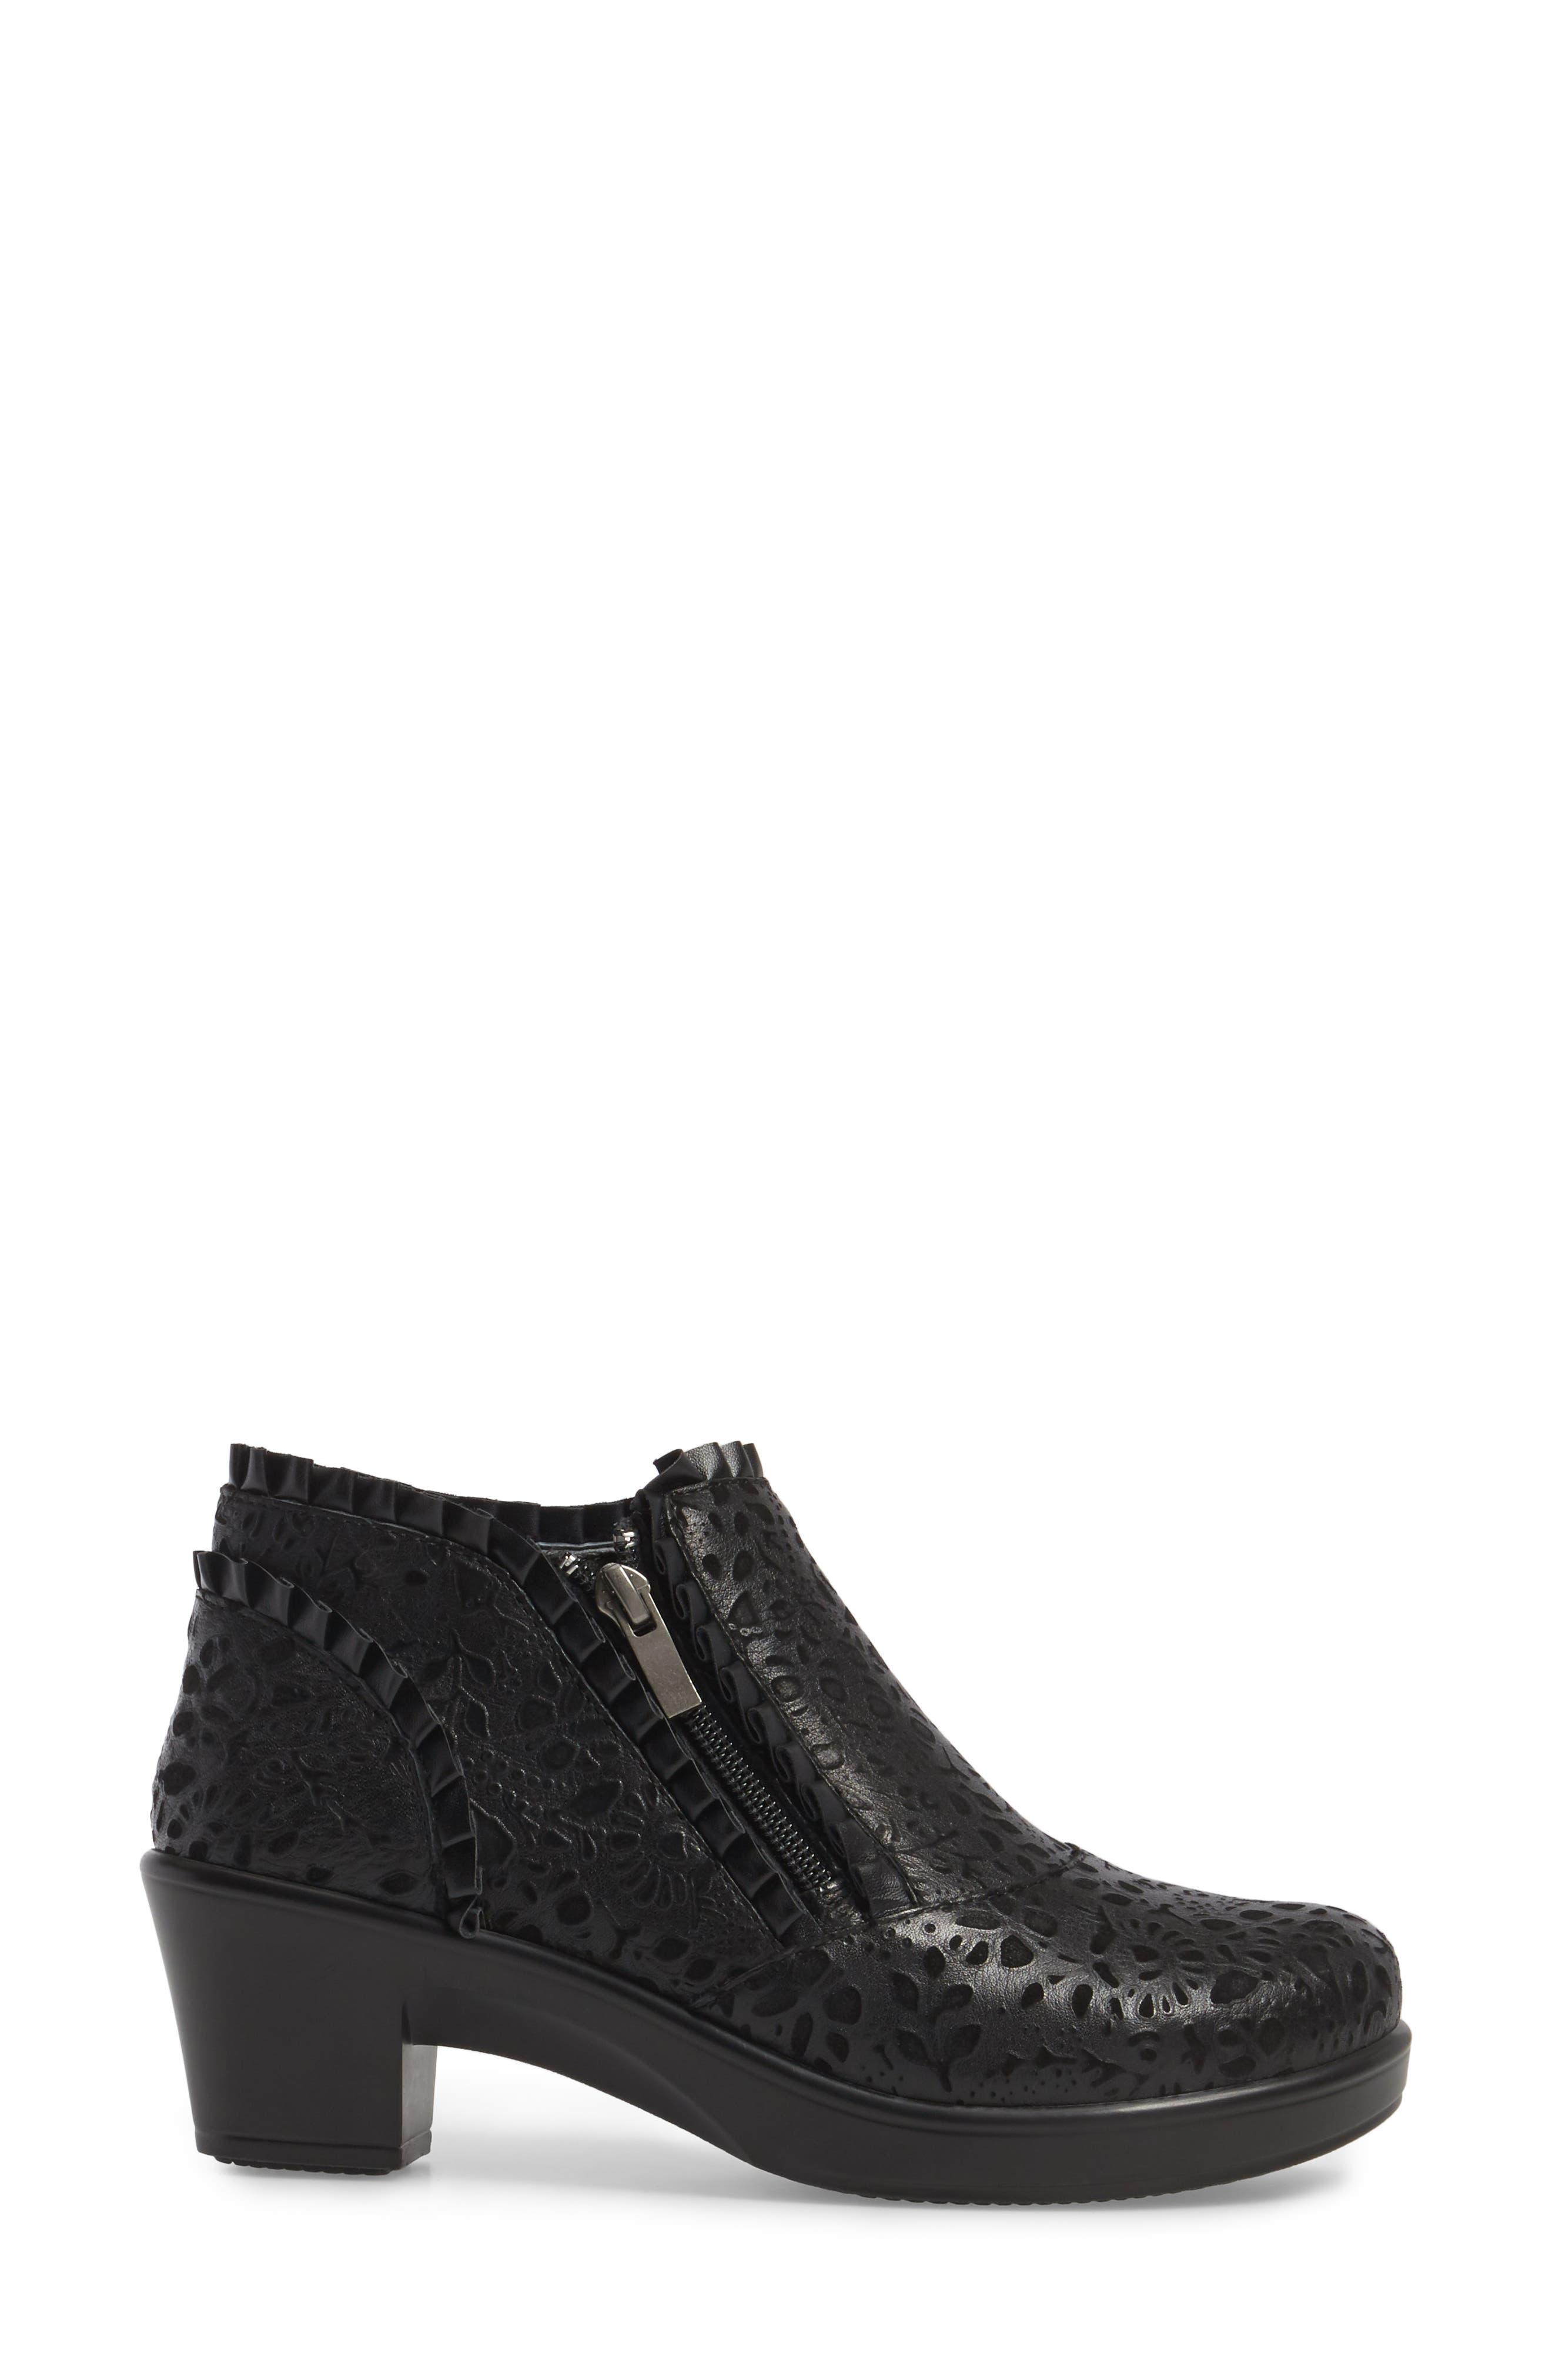 'Hannah' Saddle Boot,                             Alternate thumbnail 3, color,                             Delicut Leather